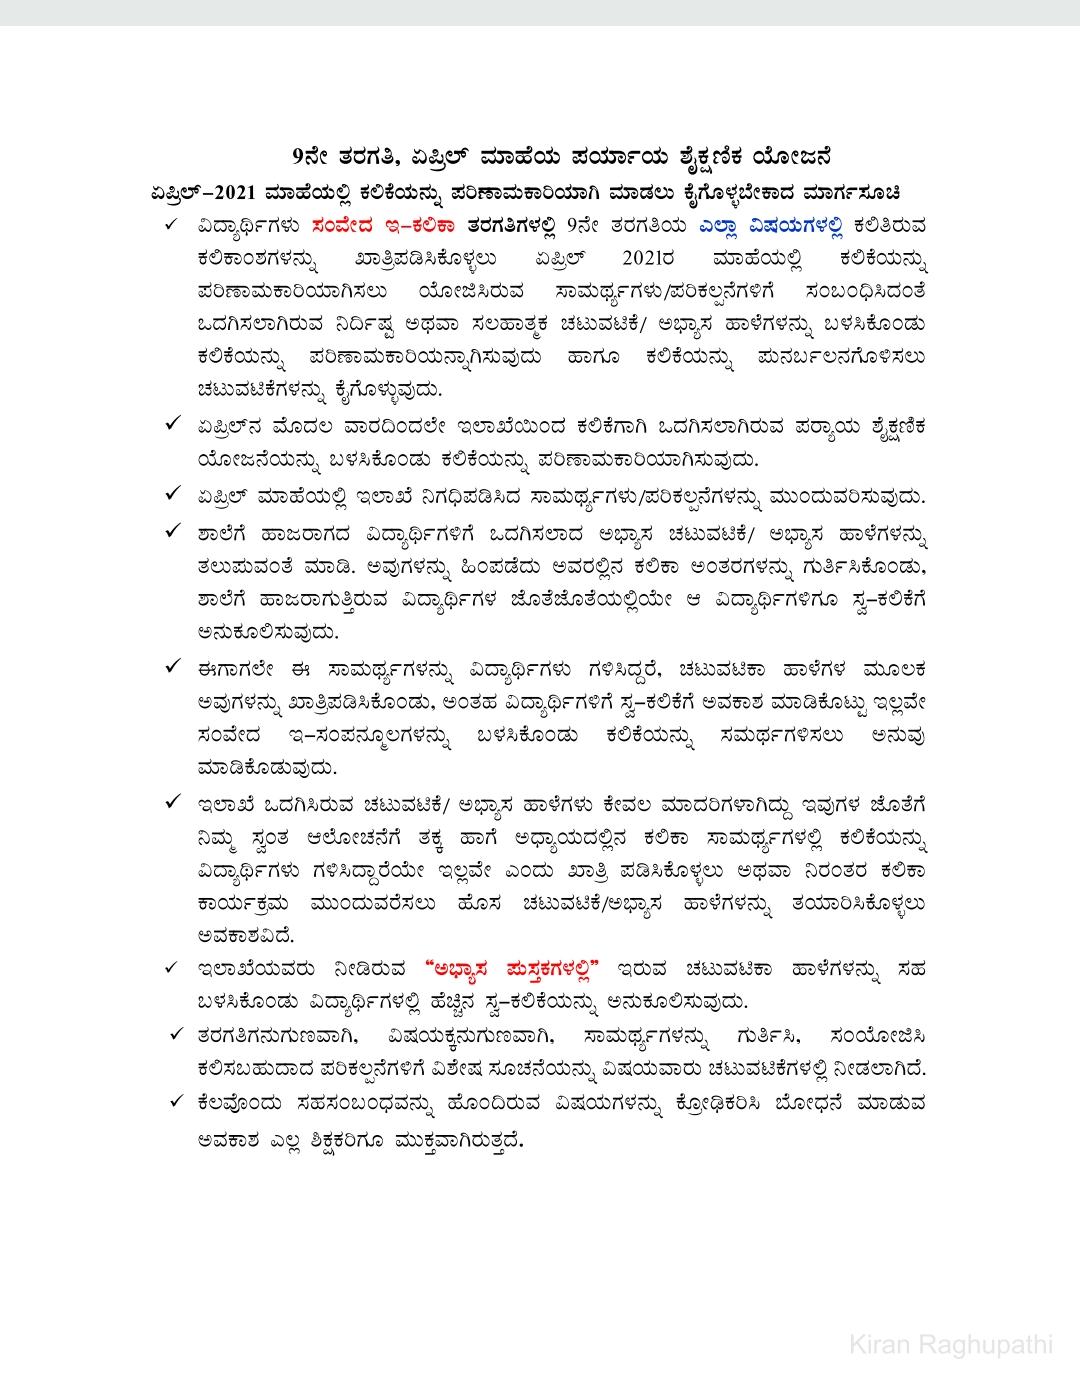 9th Class April 2021 Mahe's Alternative Educational Project